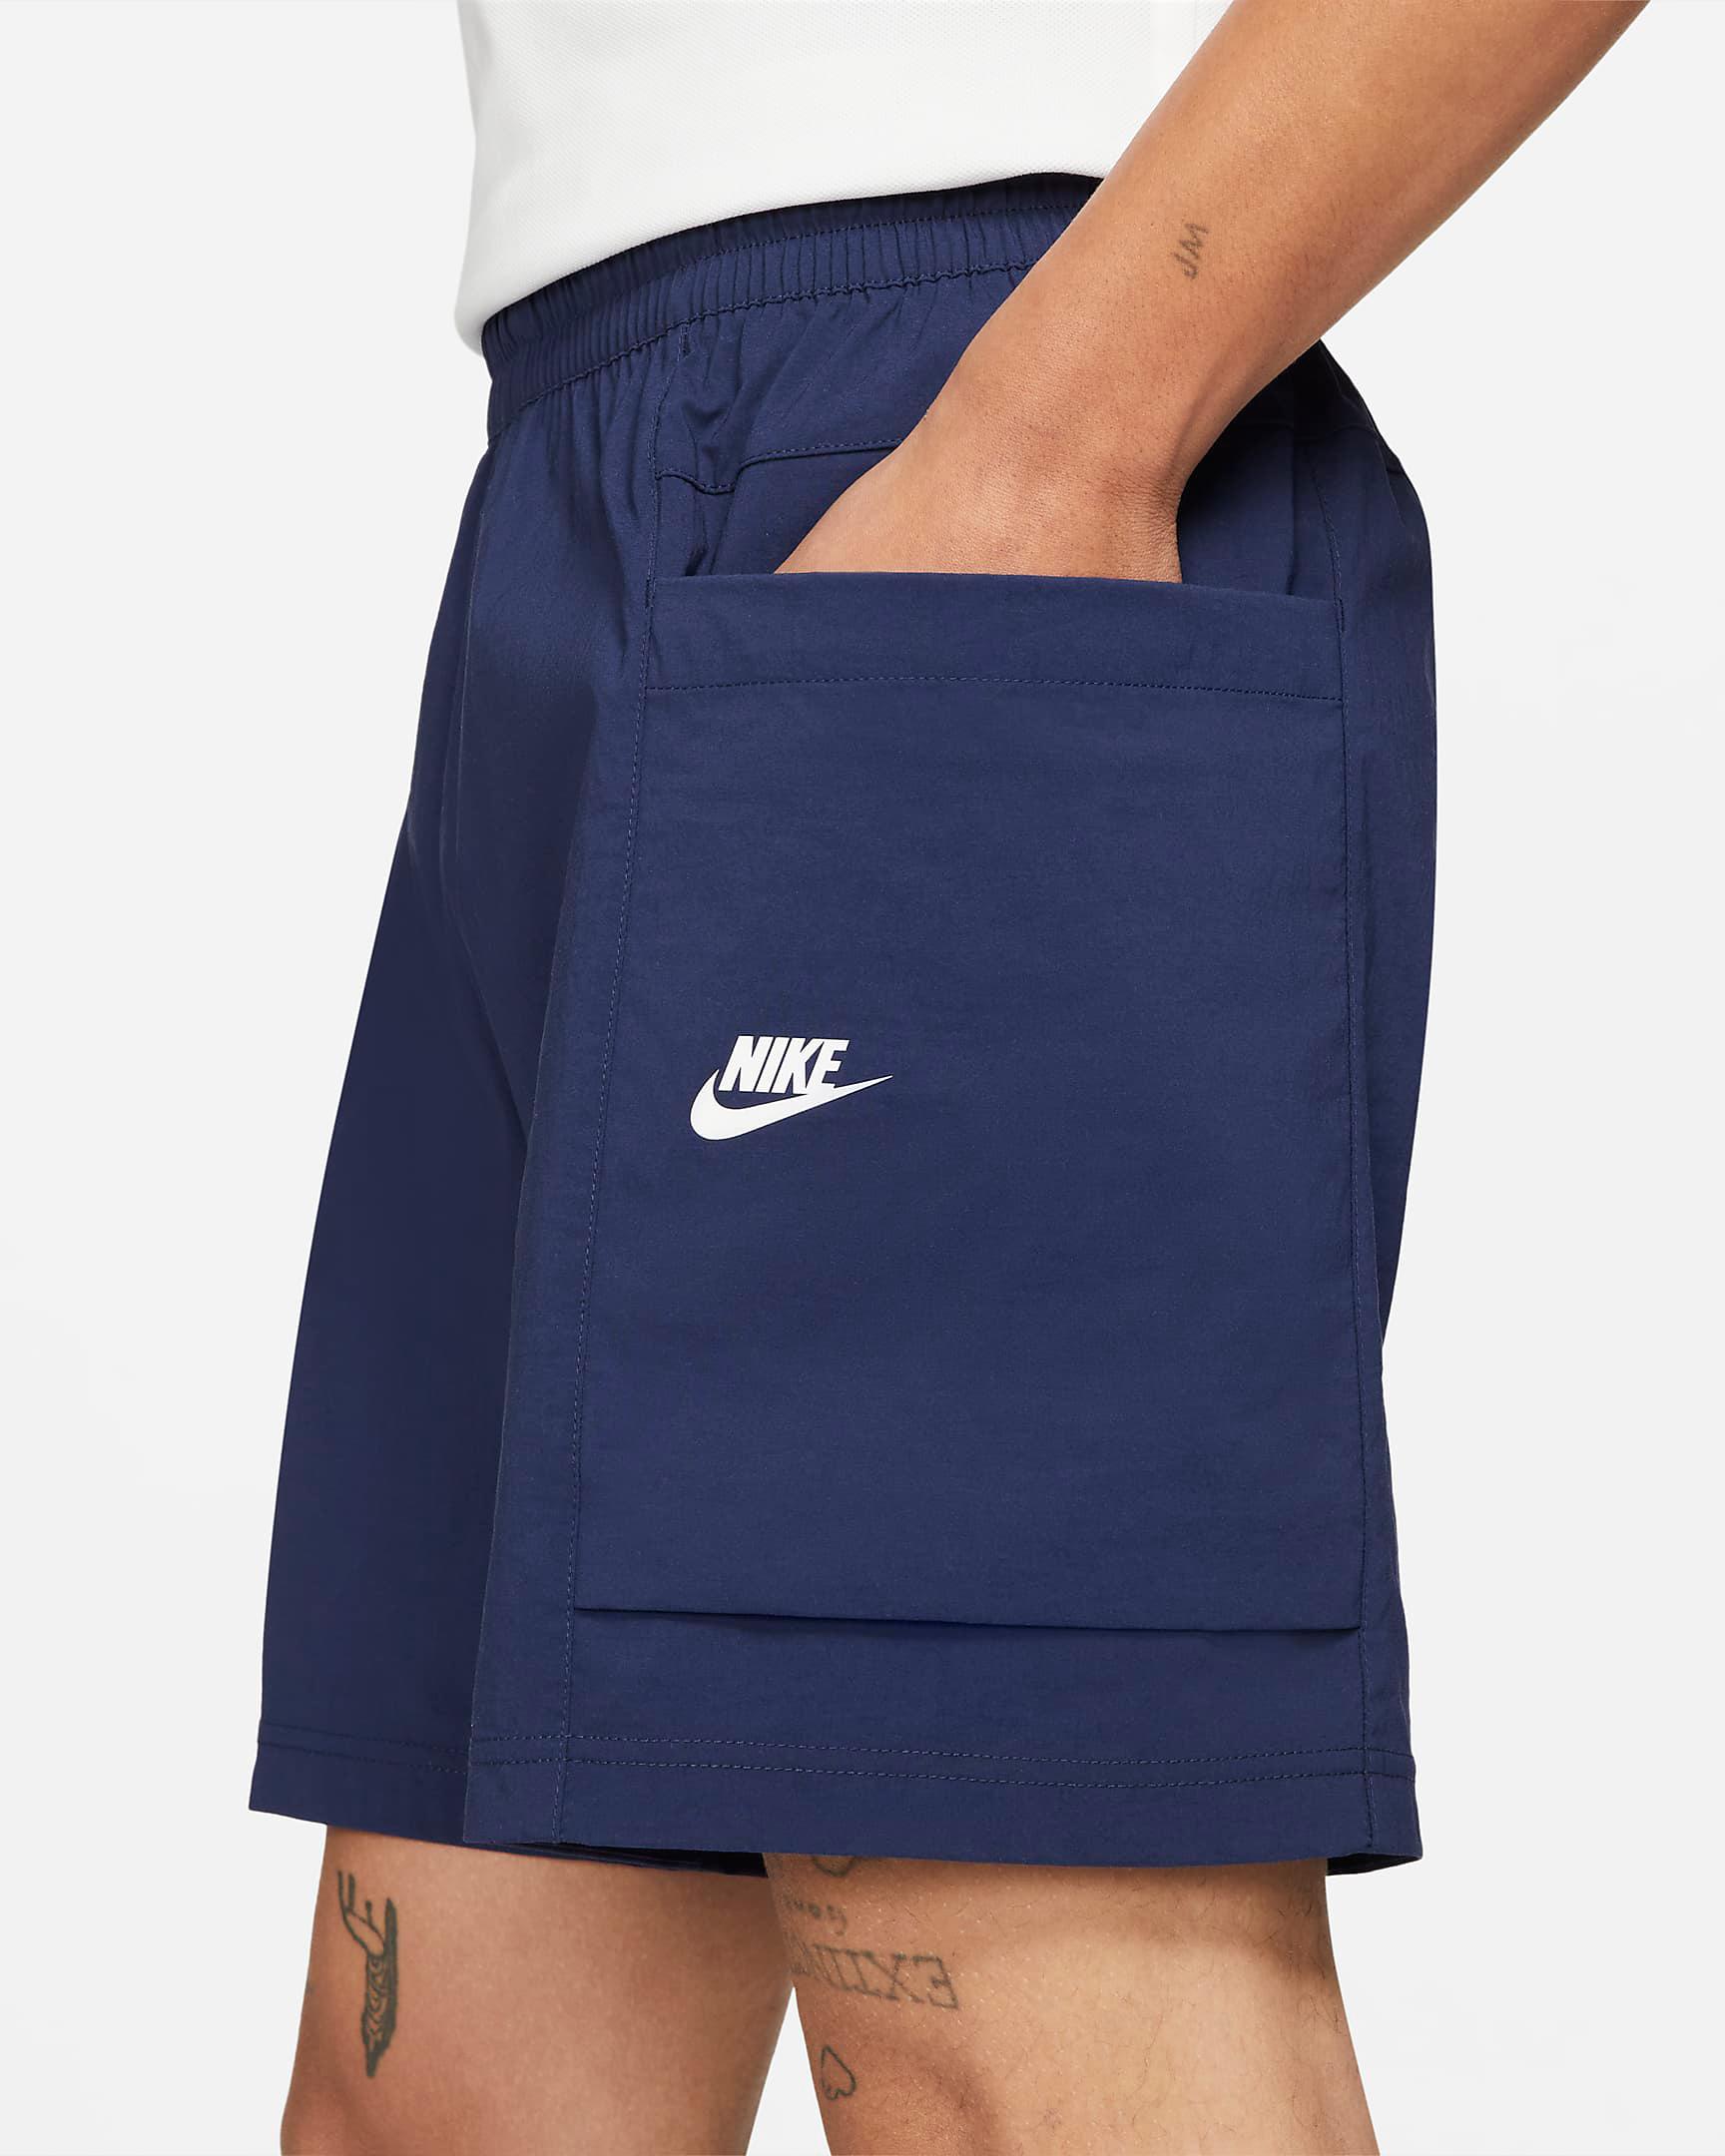 nike-midnight-navy-modern-woven-shorts-2